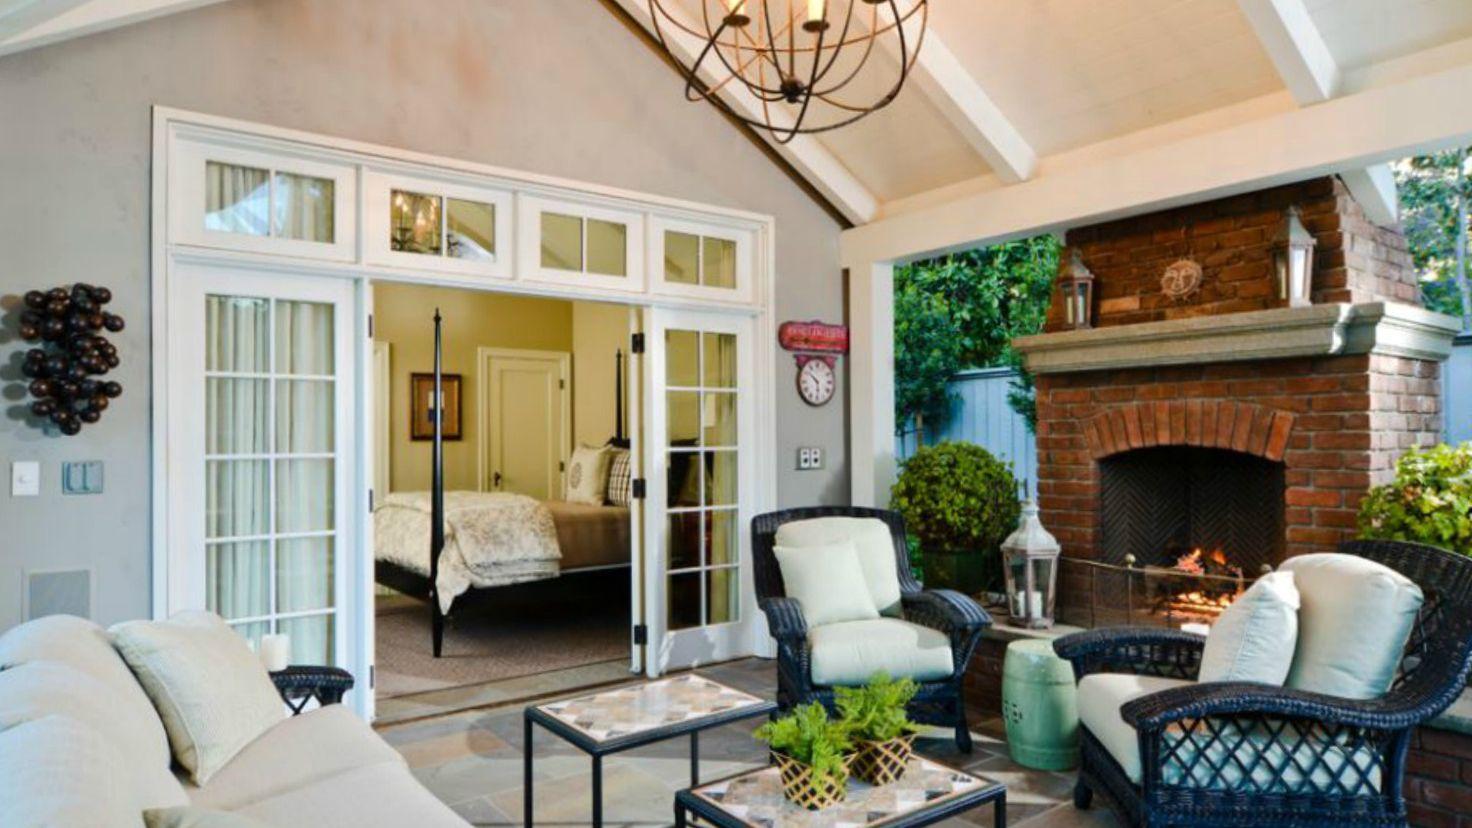 49 Outdoor Living Room Design Ideas